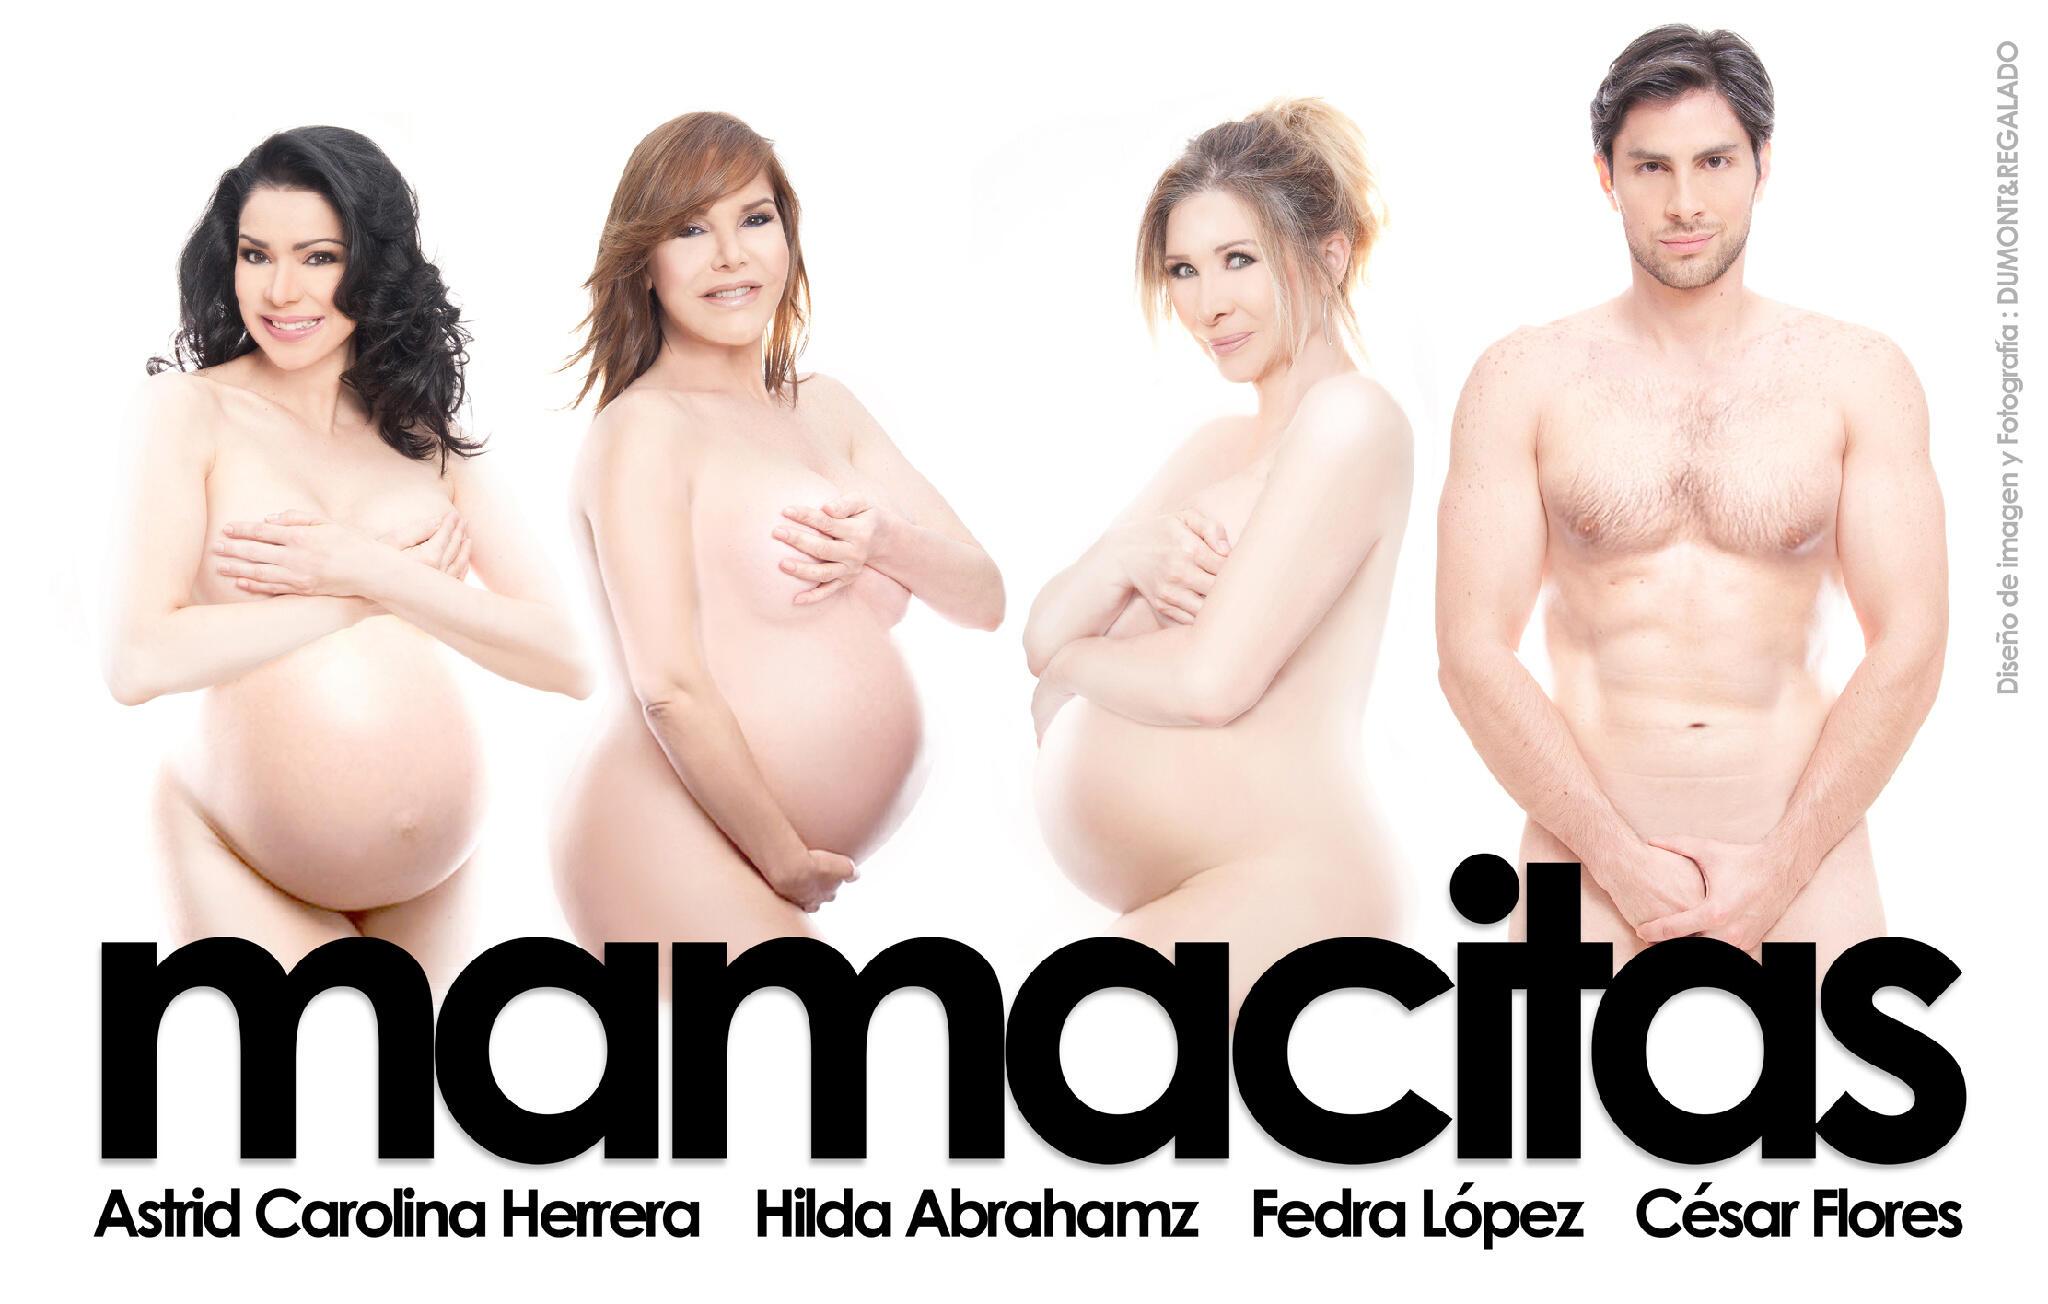 Astrid Carolina Herrera, Hilda Abrahamz, Fedra López EMBARAZADAS! #mamacitas by @DumontRegalado #Teatrex #Pronto http://t.co/6CLKgS5zwx